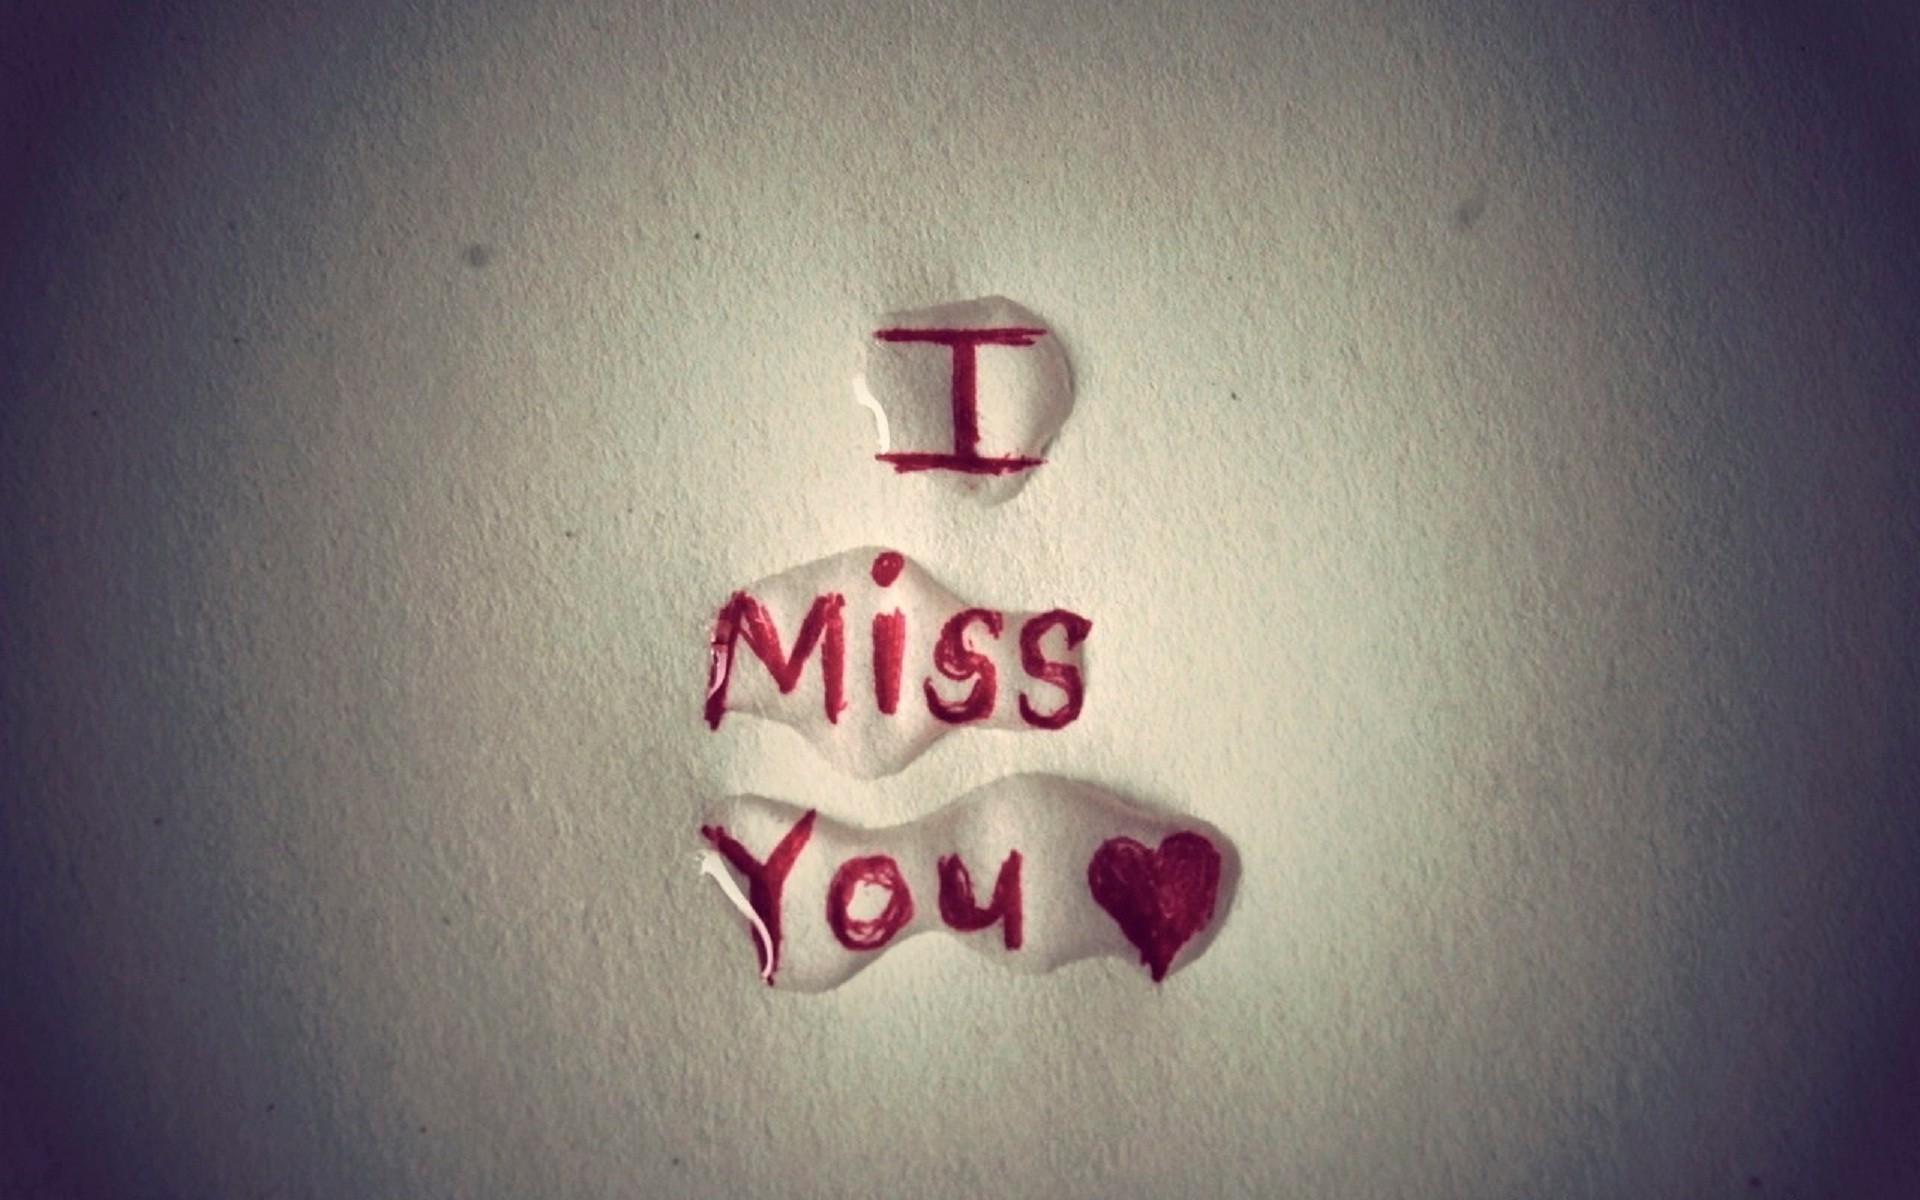 1080x1920 I Miss You Tears Sad HD Mobile Wallpapers Mi67